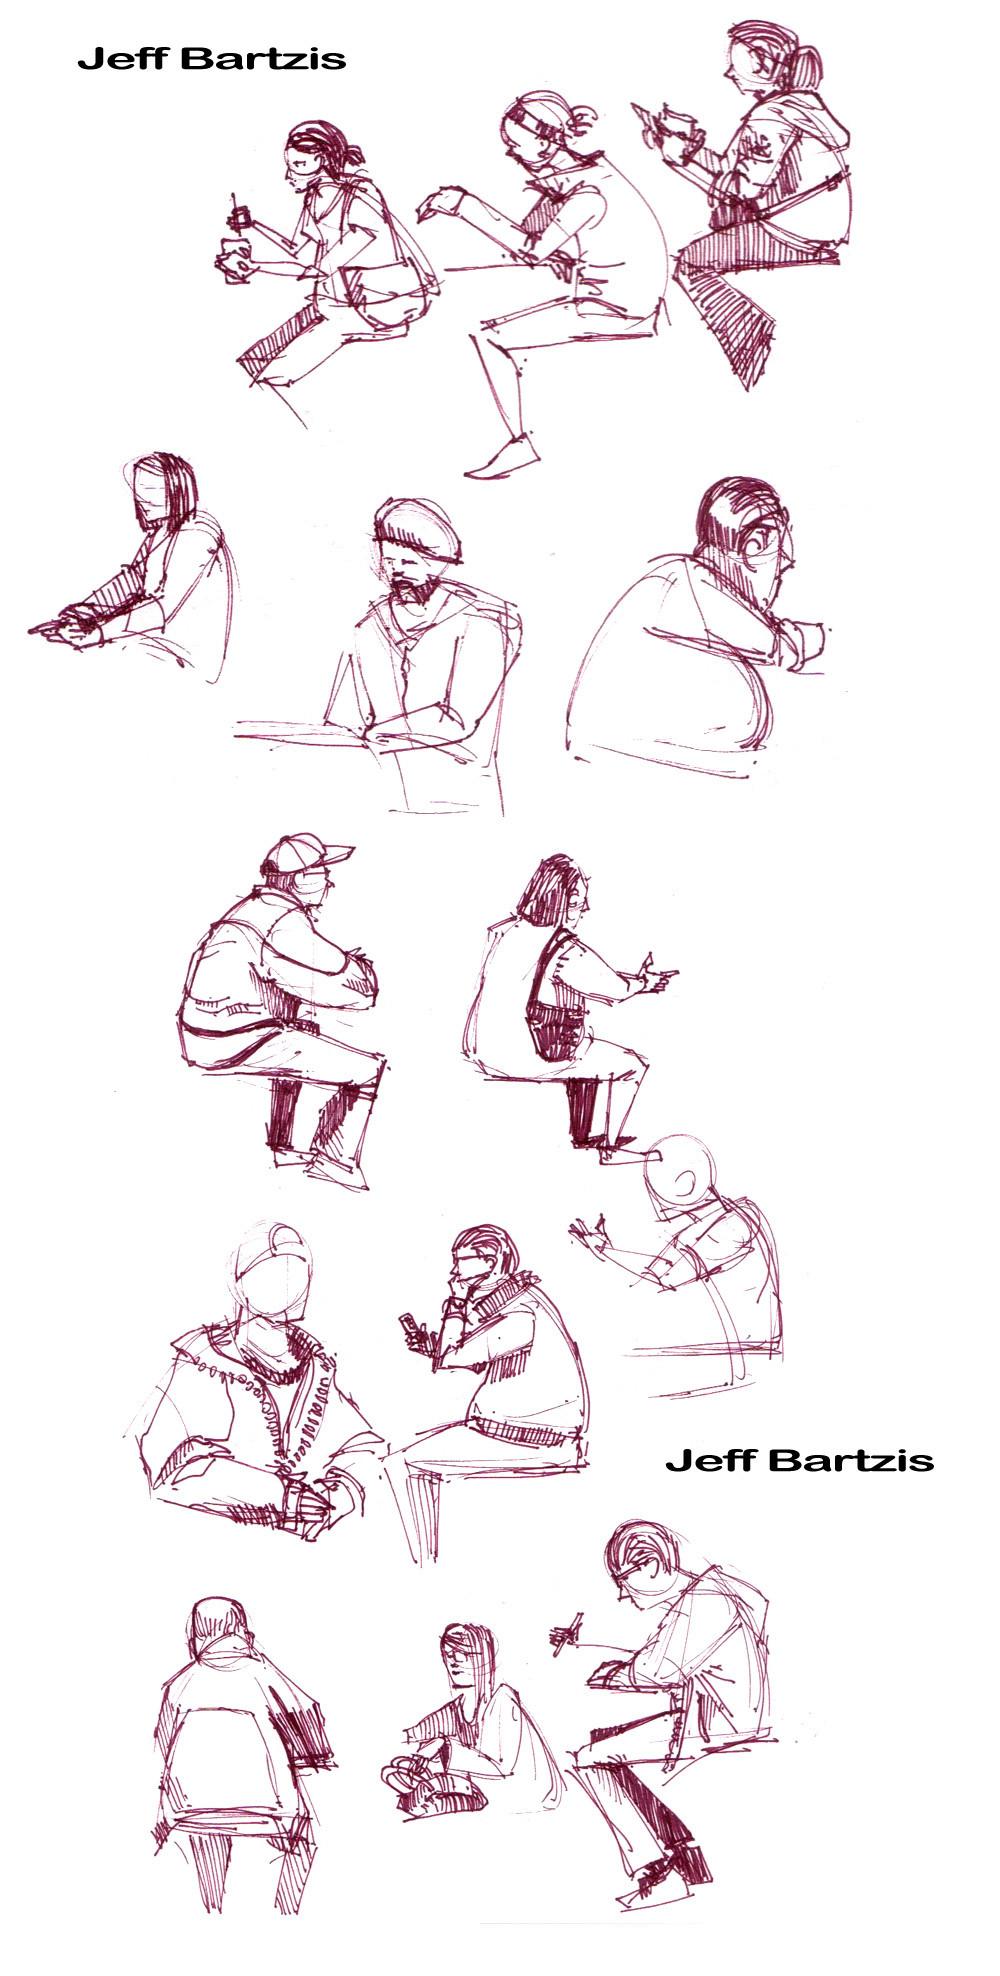 Jeff bartzis sketchbook stuff 013